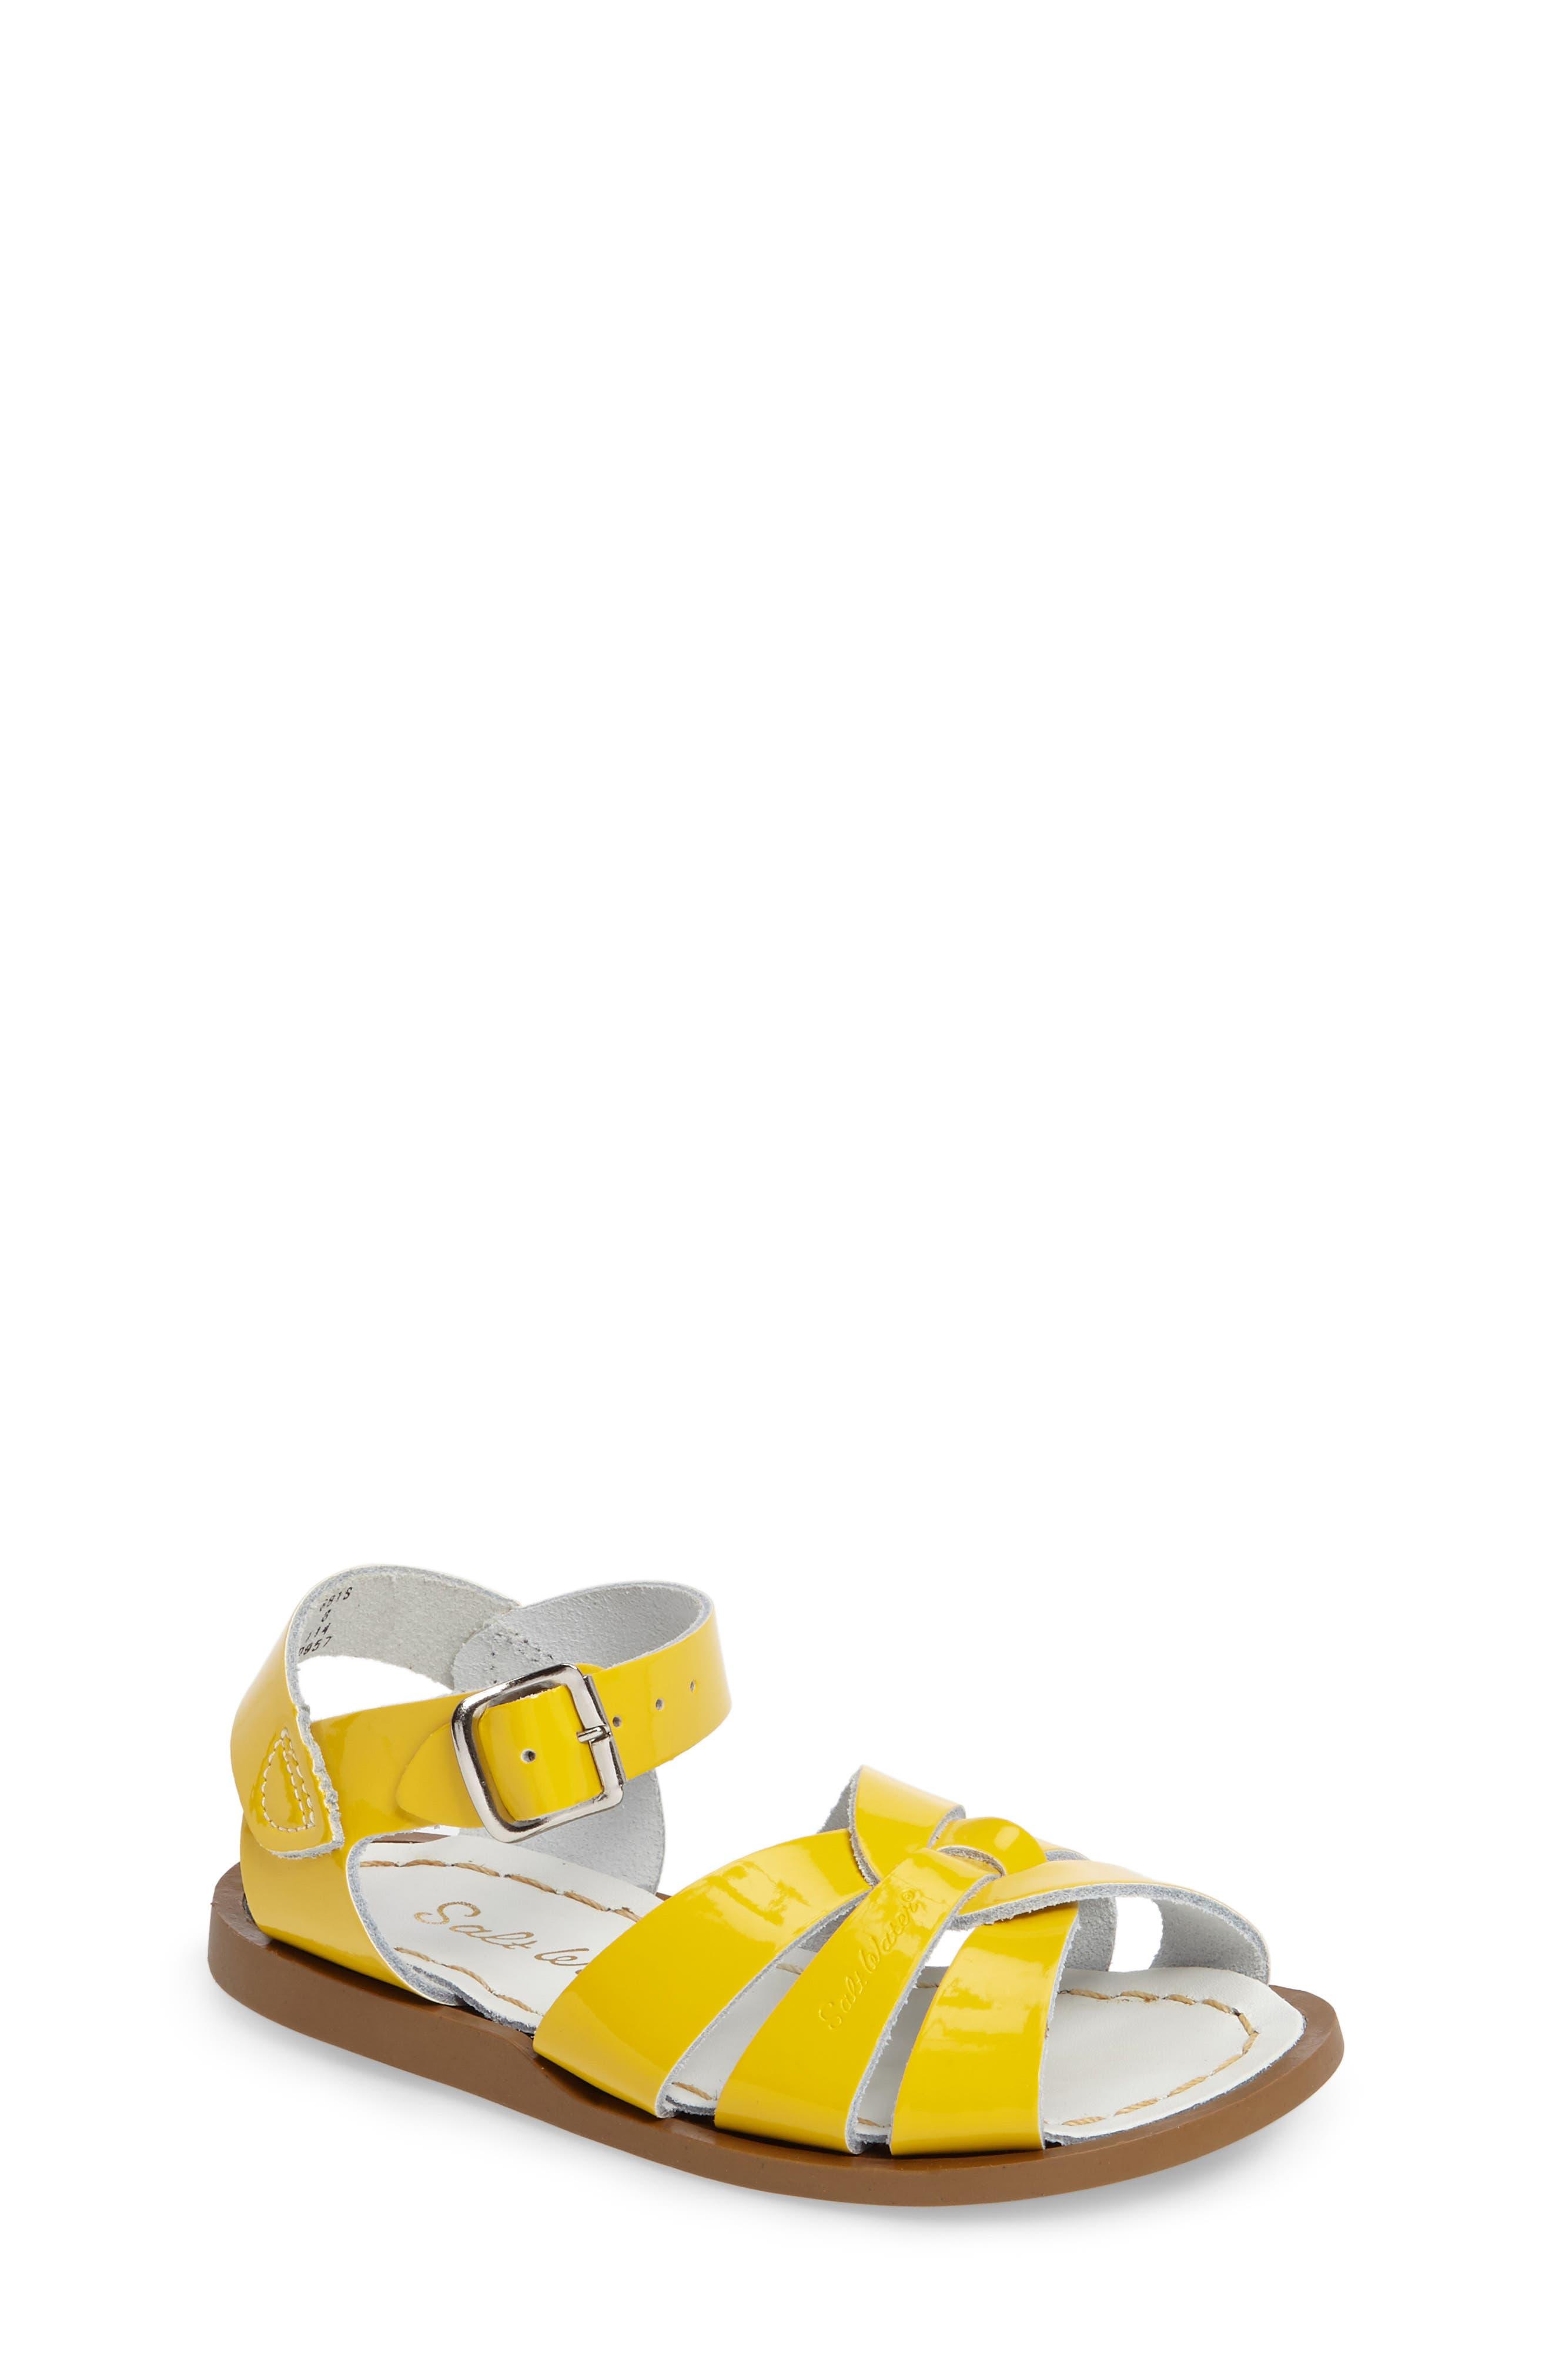 Salt water sandals girls 11 white strappy slide NEW made in USA